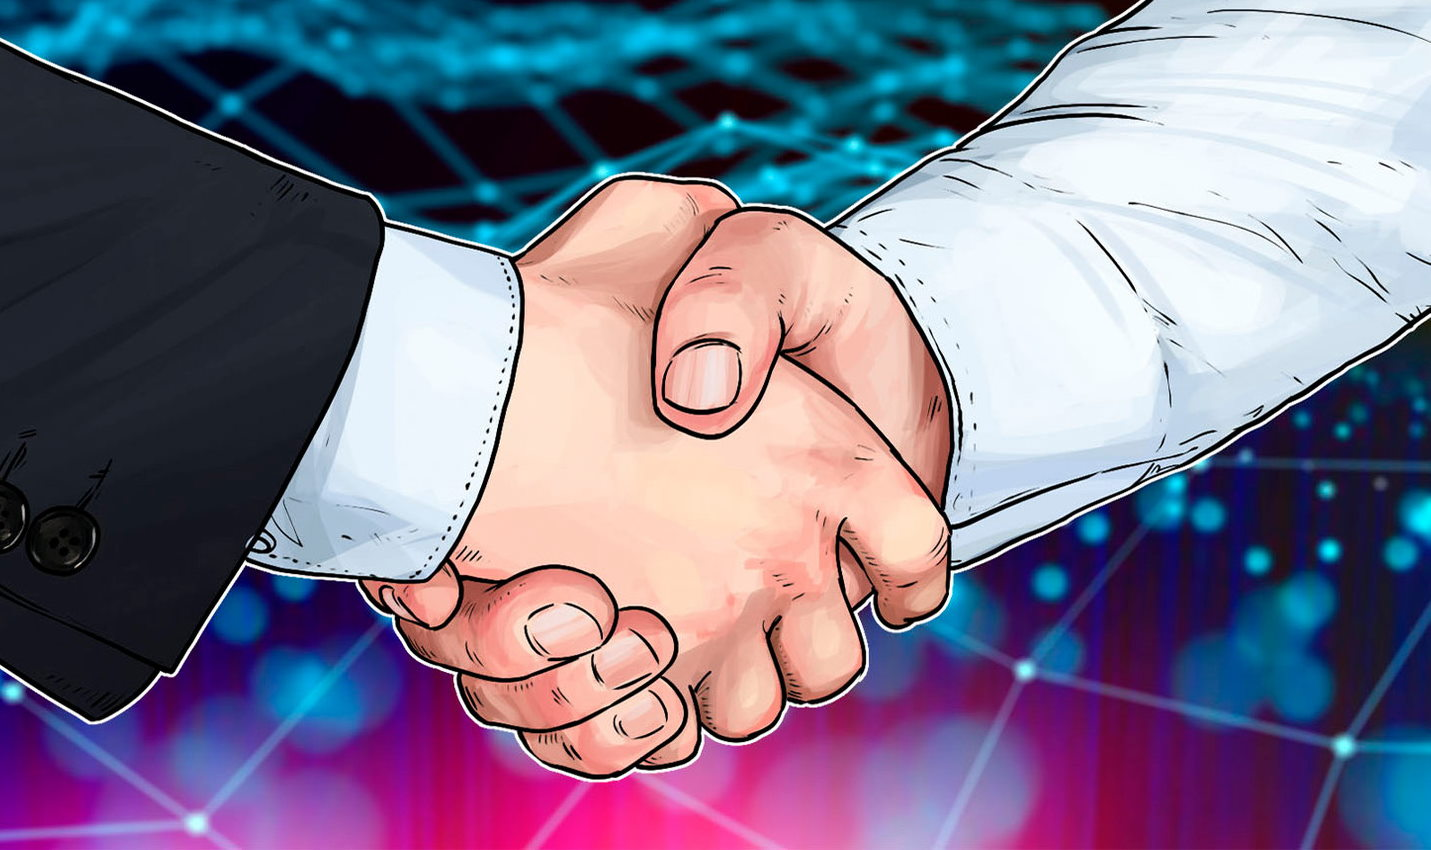 a16z fund backs Celo cryptocurrency